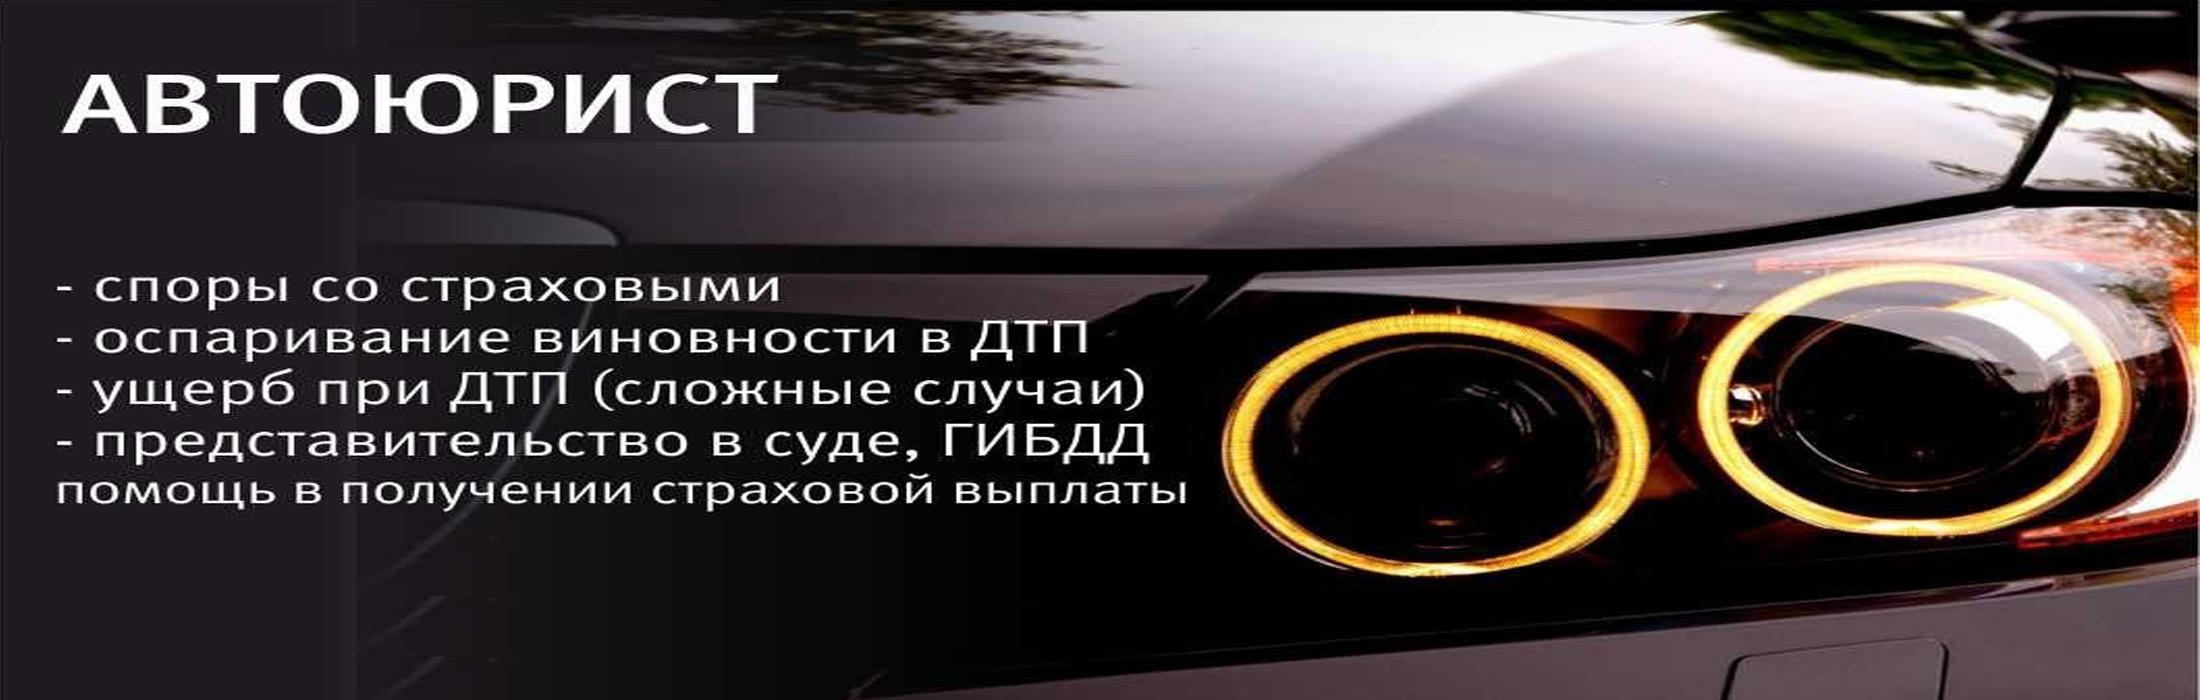 121111111111